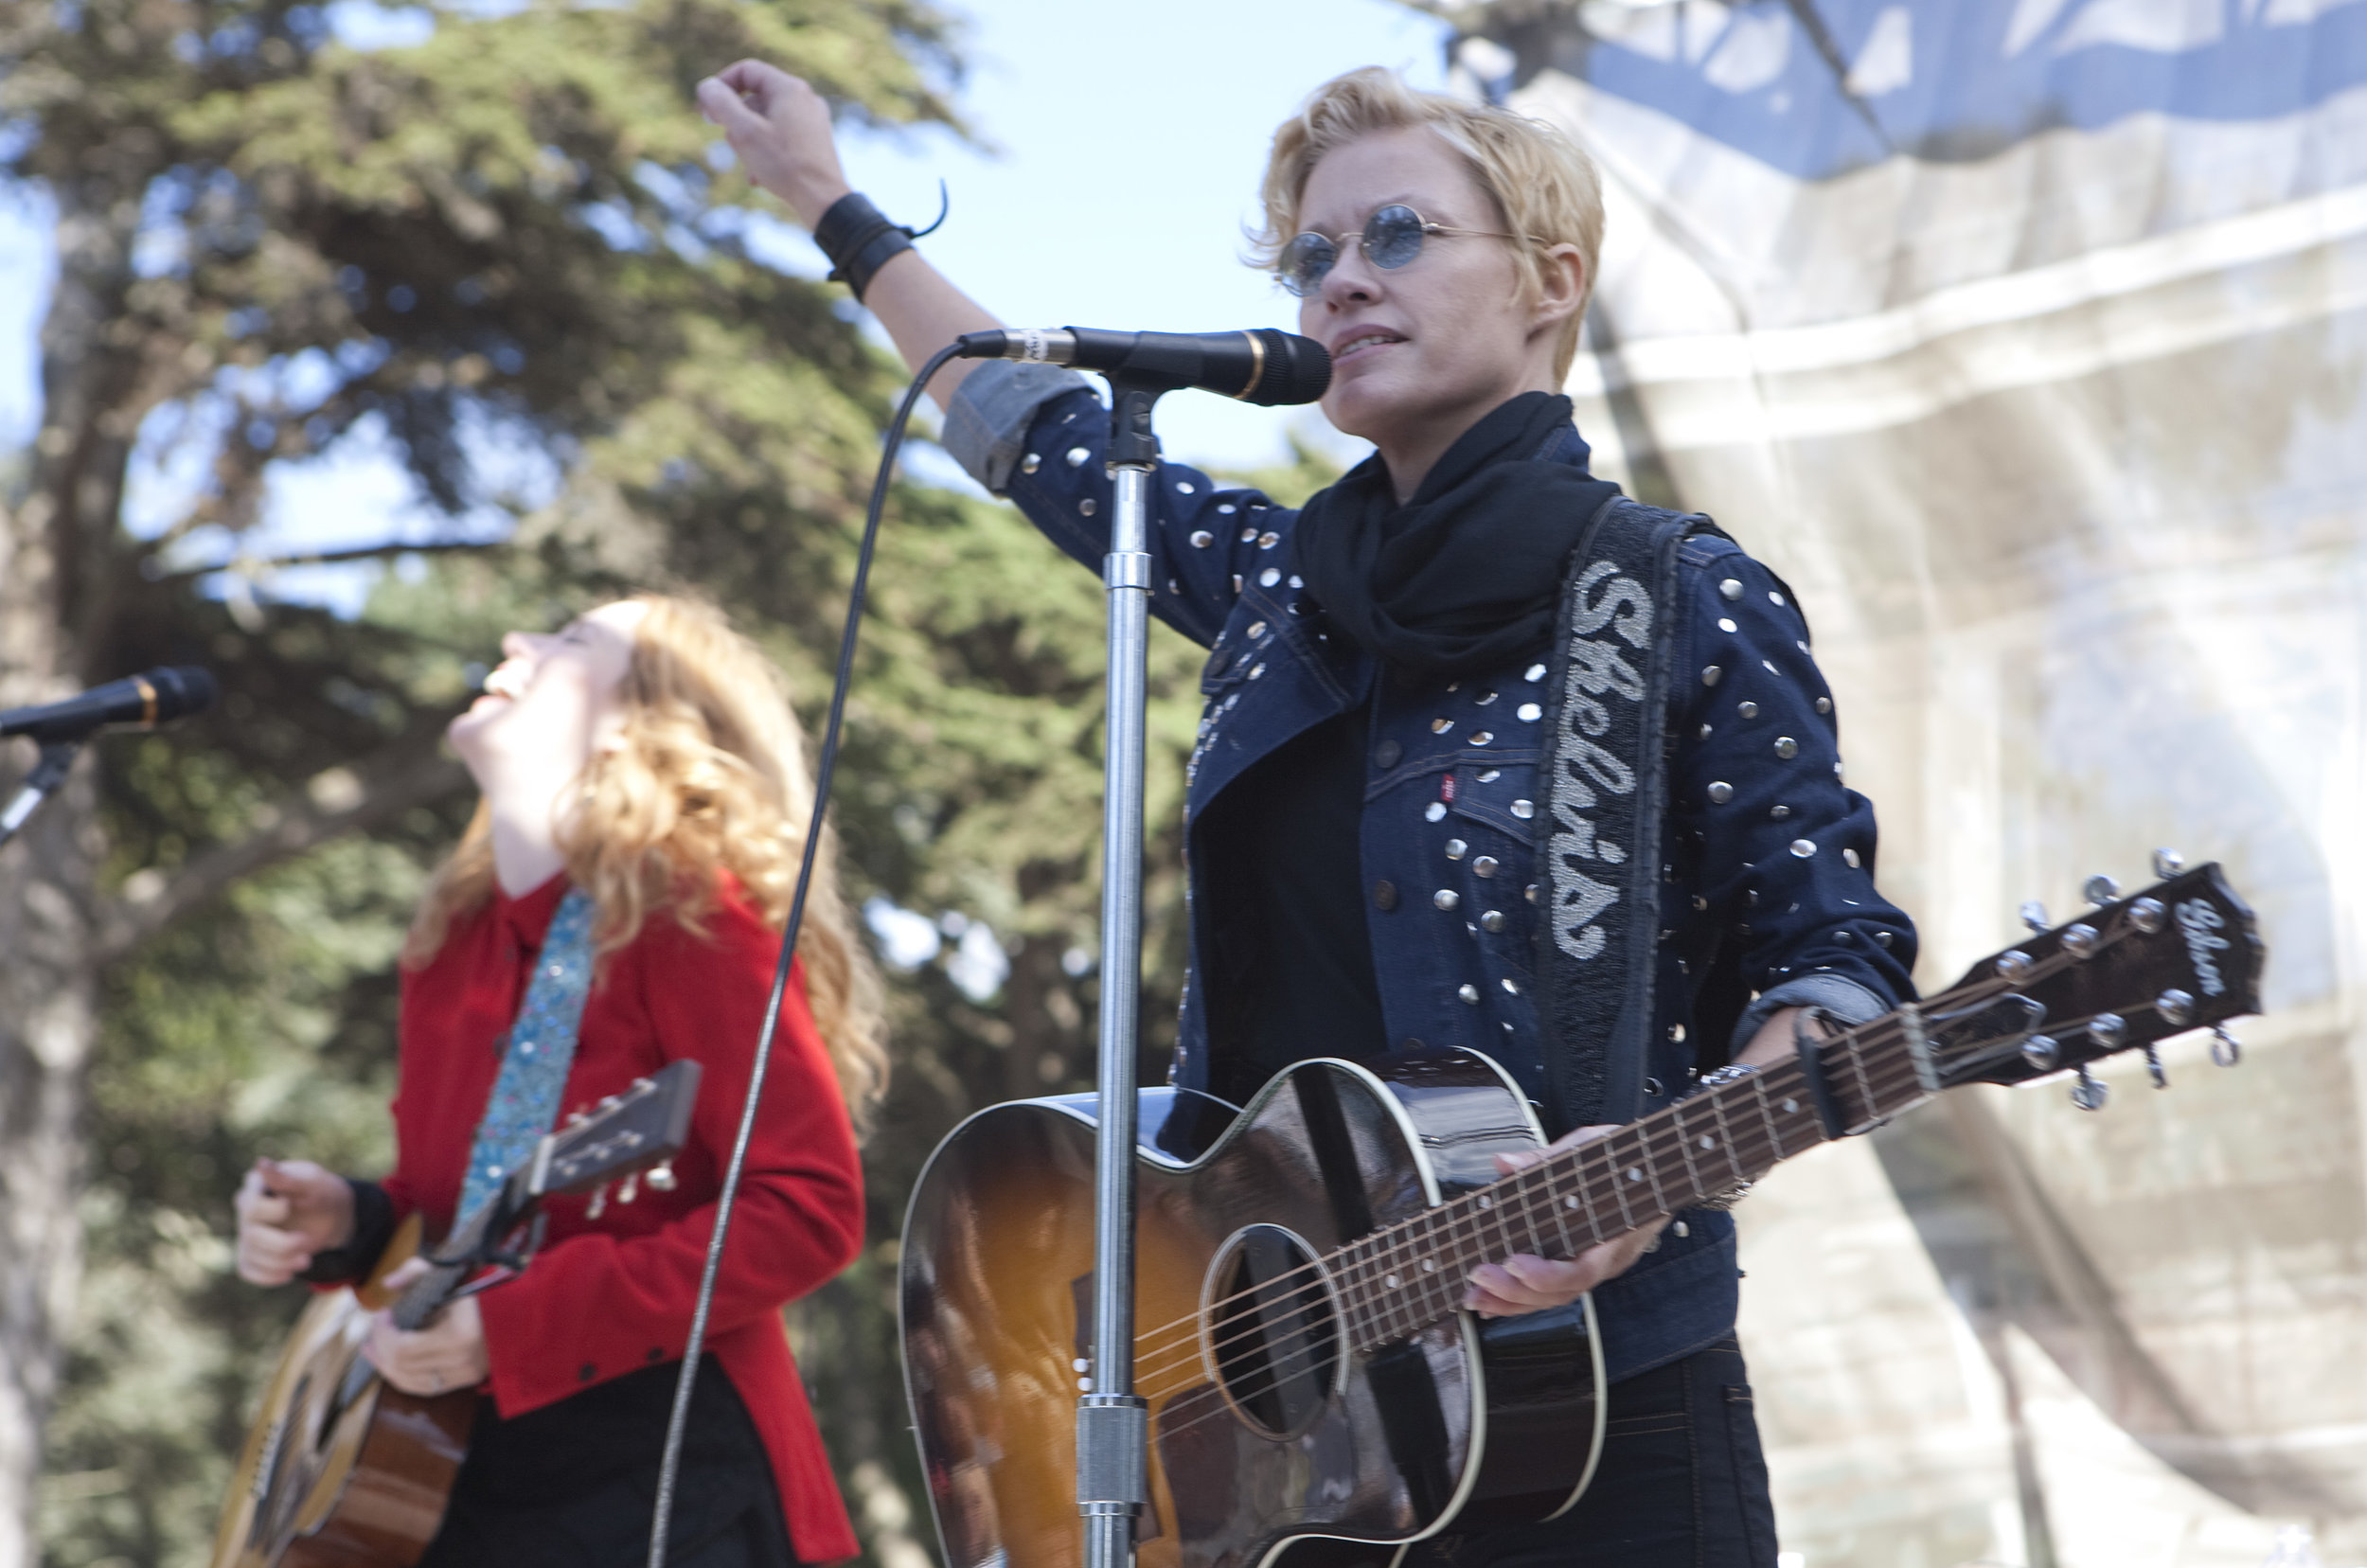 Copy of Shelby Lynne & Allison Moorer, San Francisco 2010